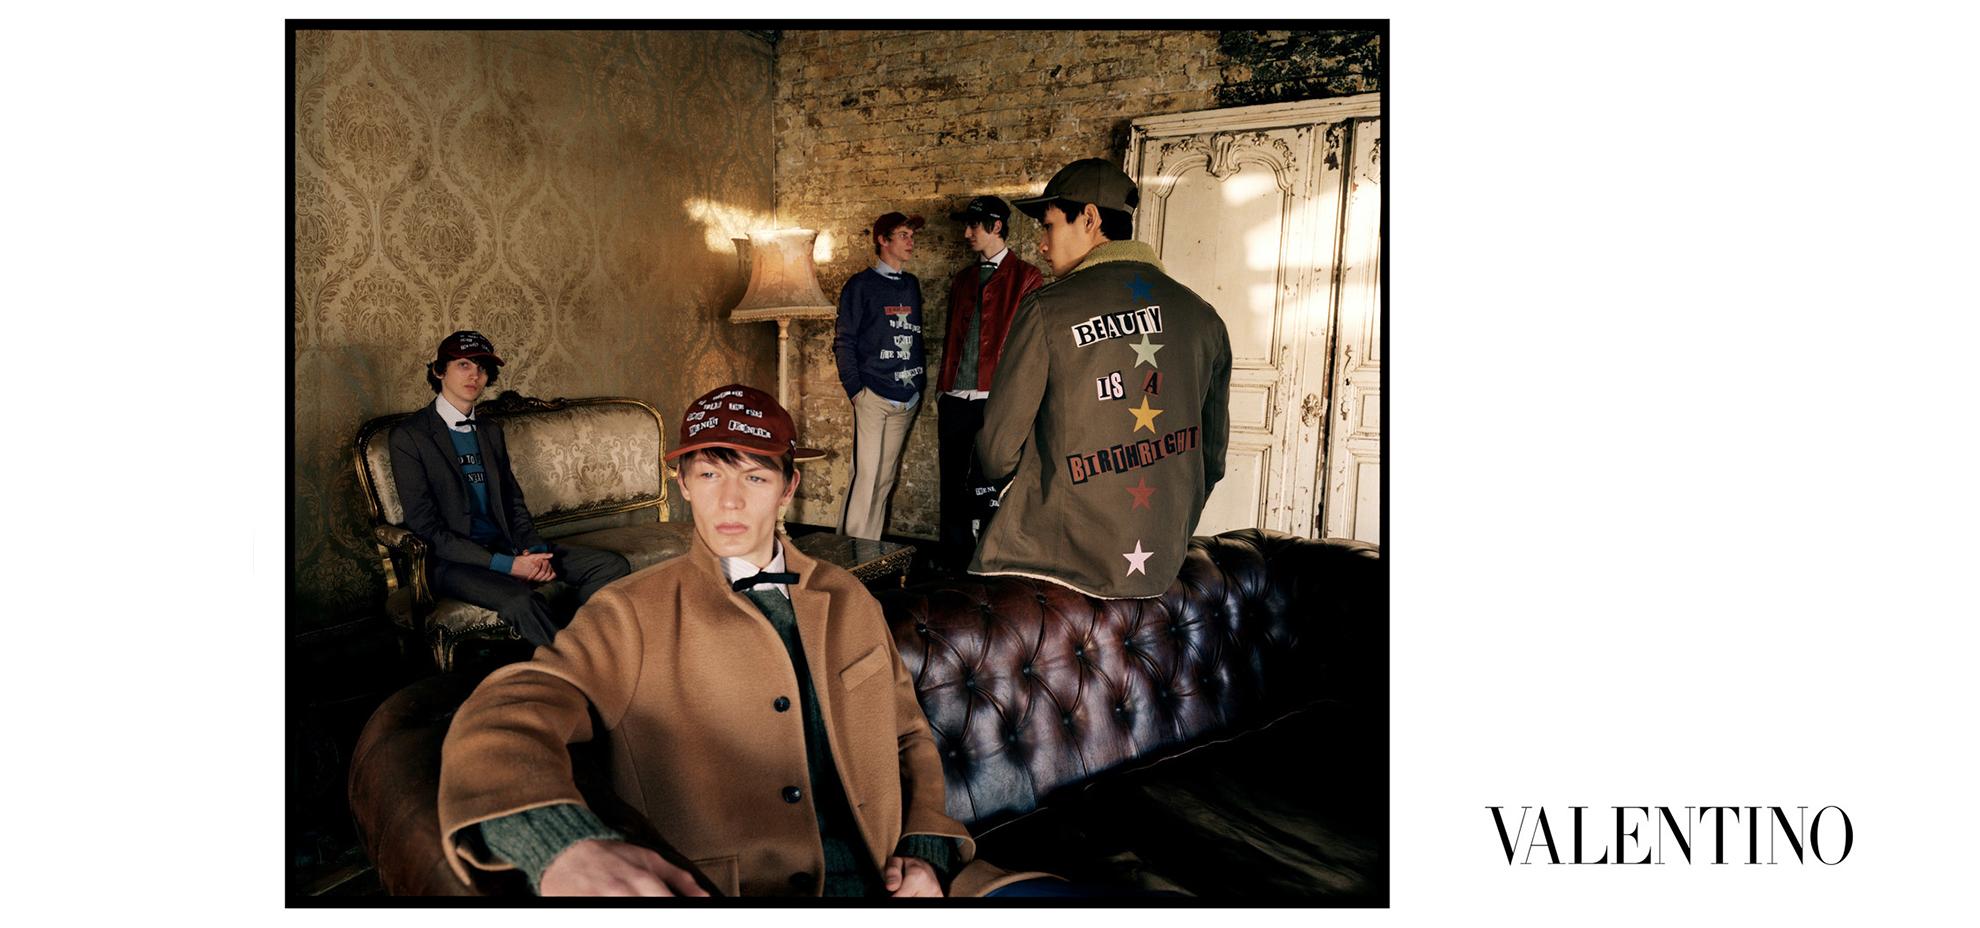 Valentino Man's Clothing Autumn/Winter 2018